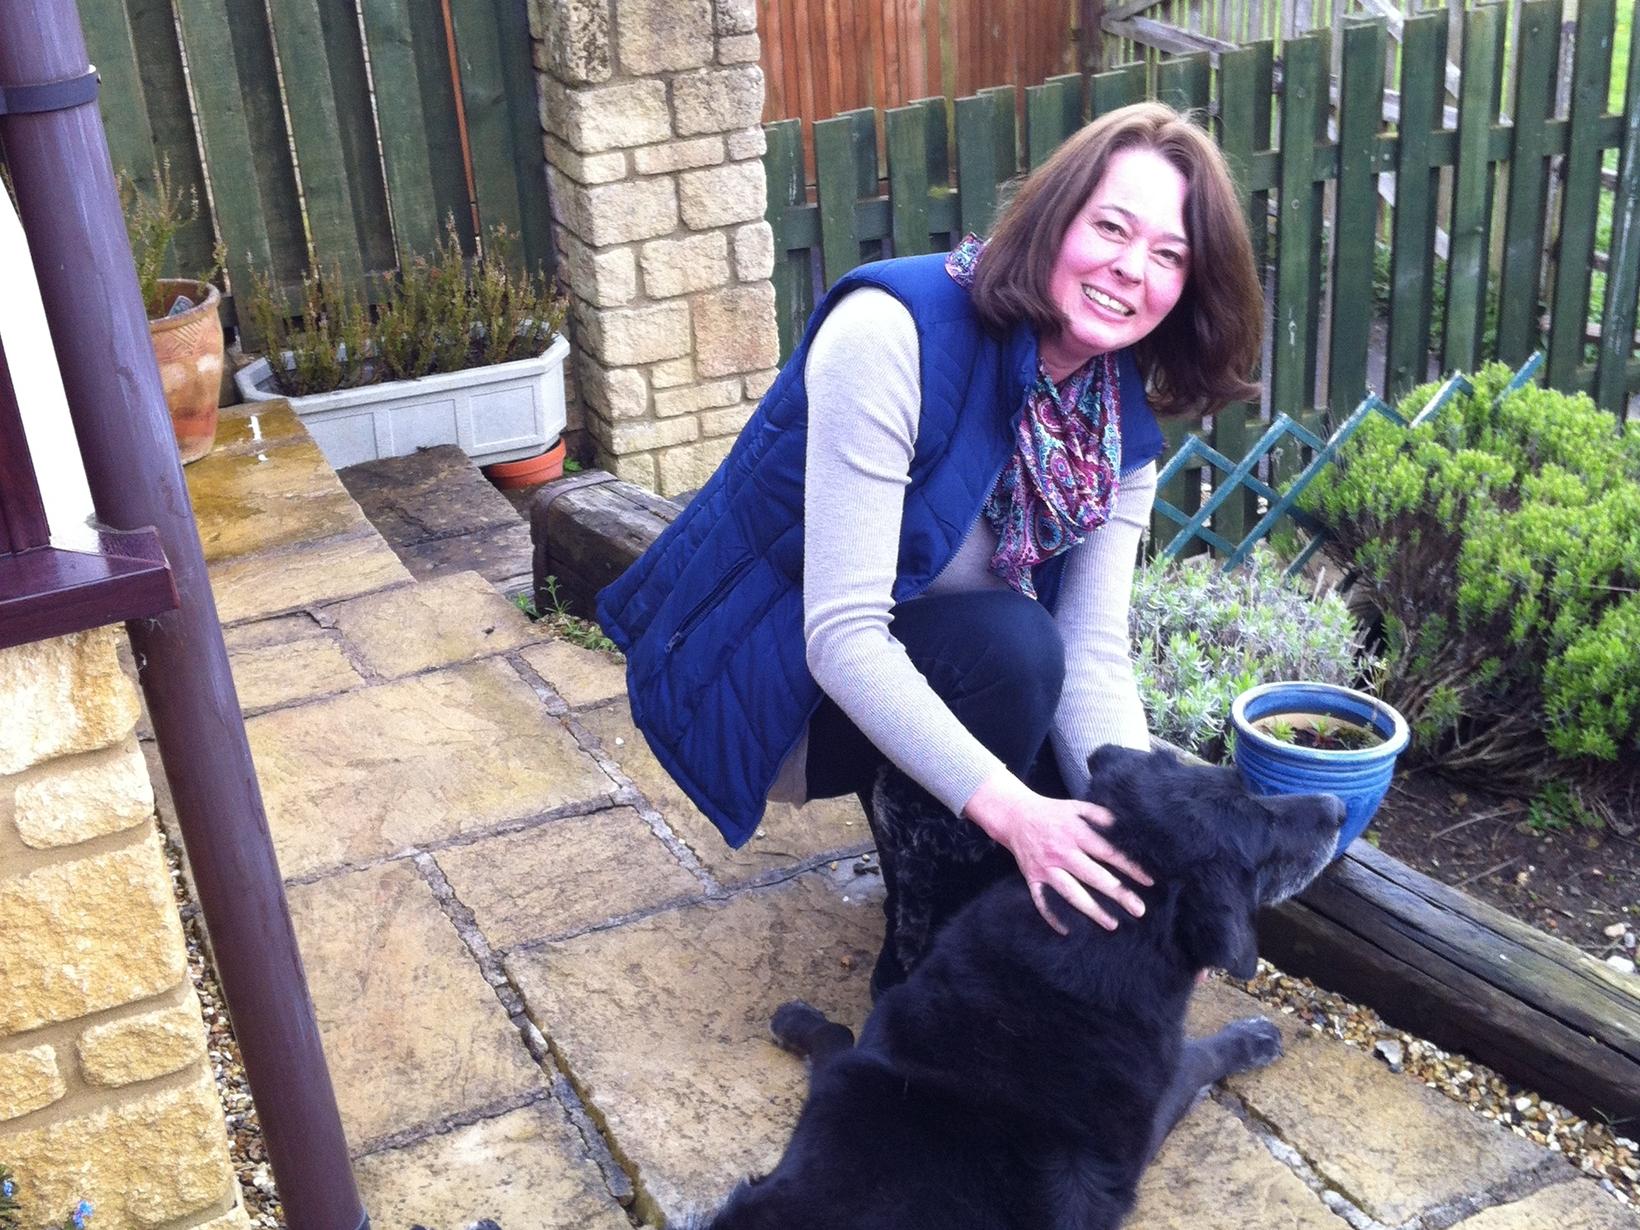 Julie from Bath, United Kingdom